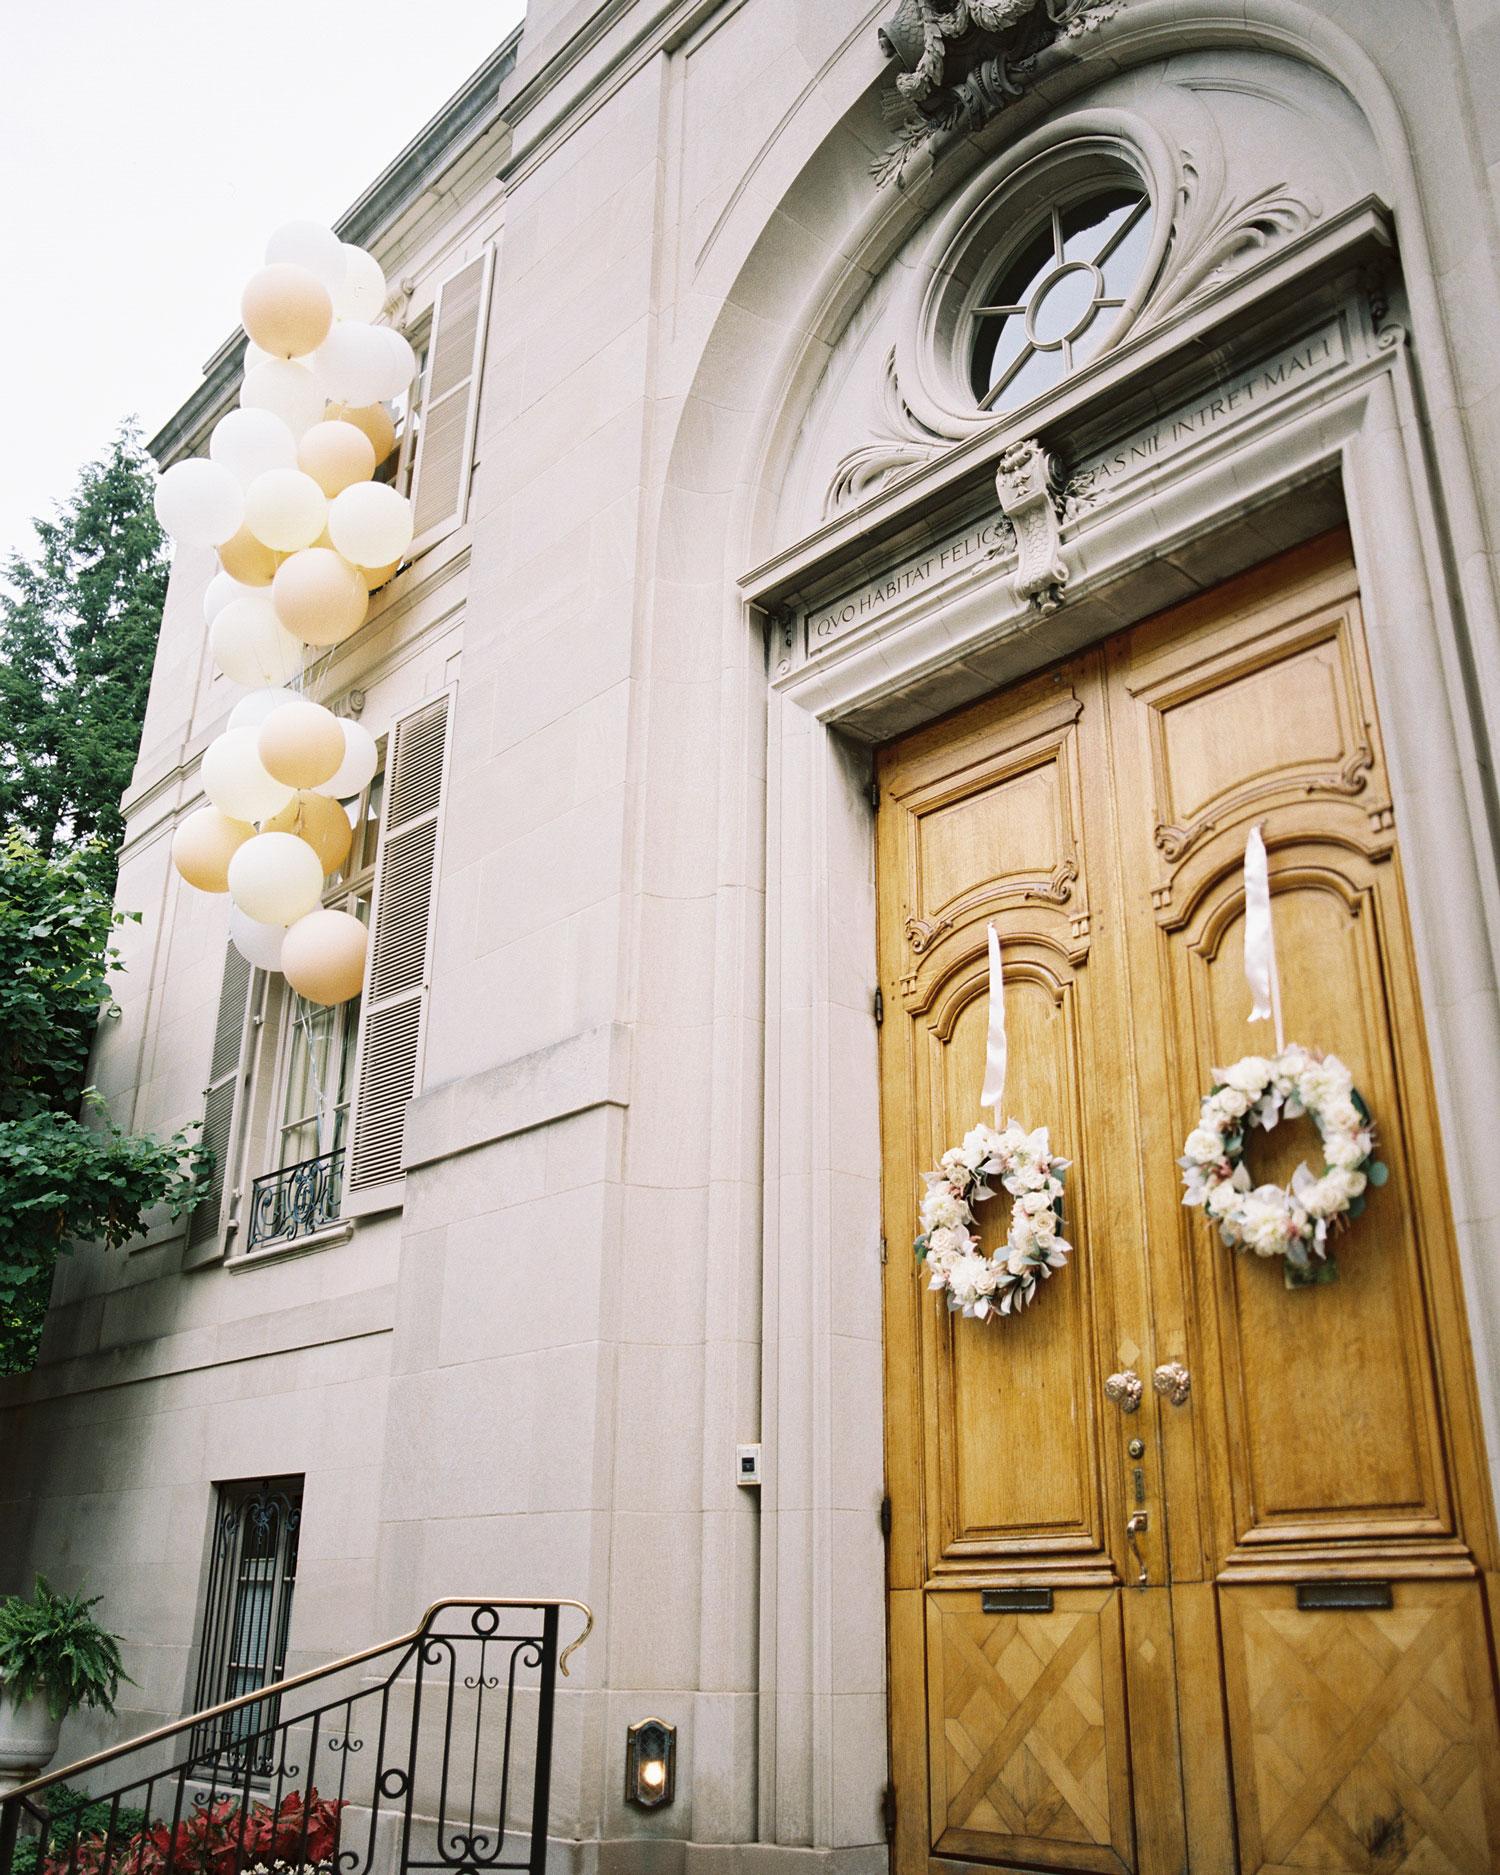 elizabeth-cody-wedding-parisian-inspired-dc-wreaths-balloons-18-s112715.jpg